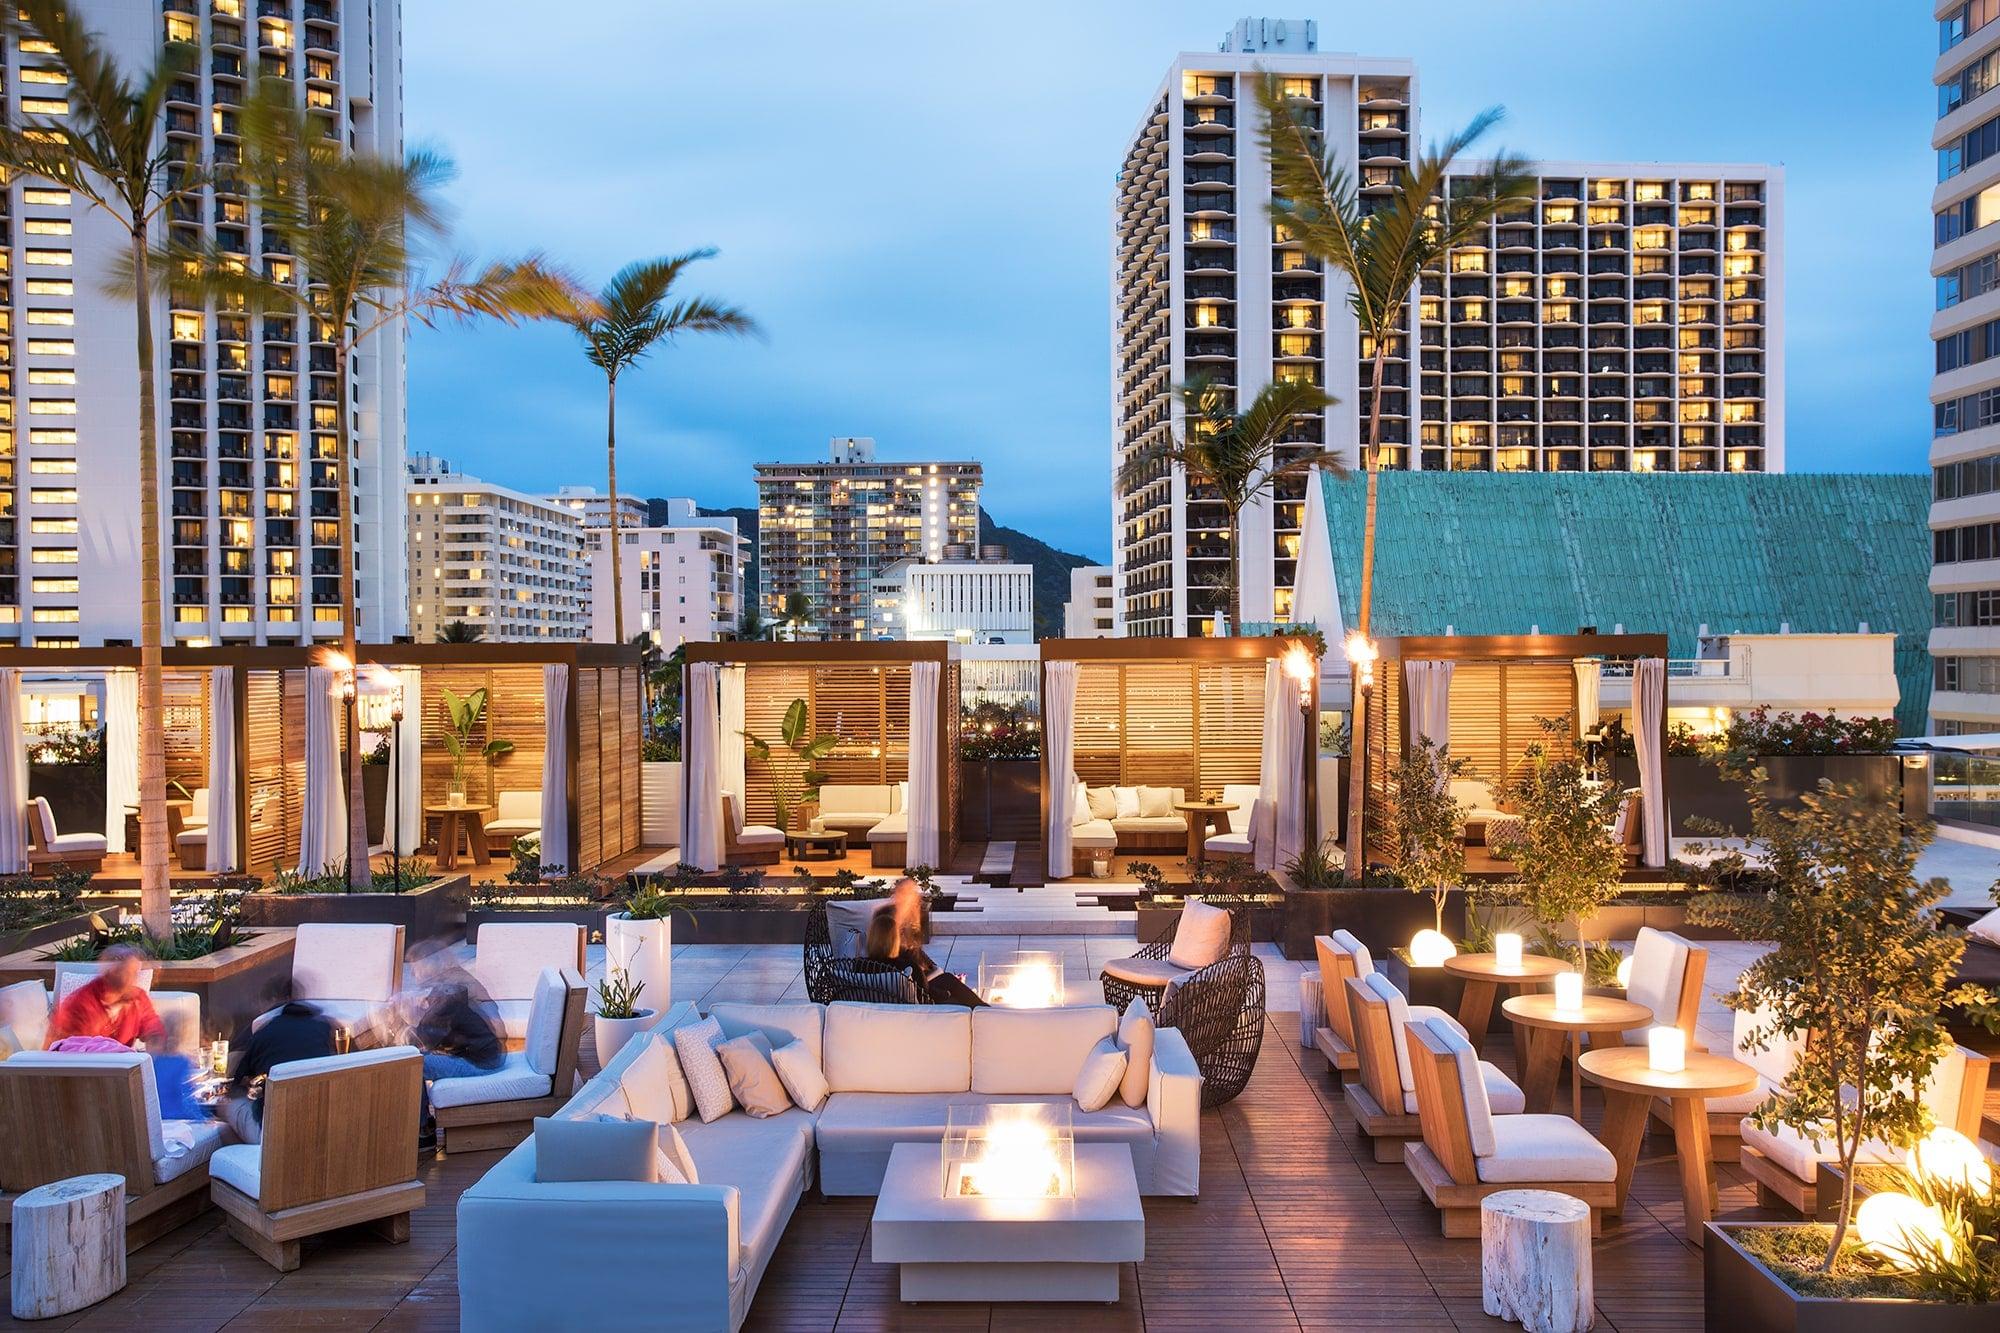 Modern 'Alohilani Resort brings sustainability to Waikiki Beach